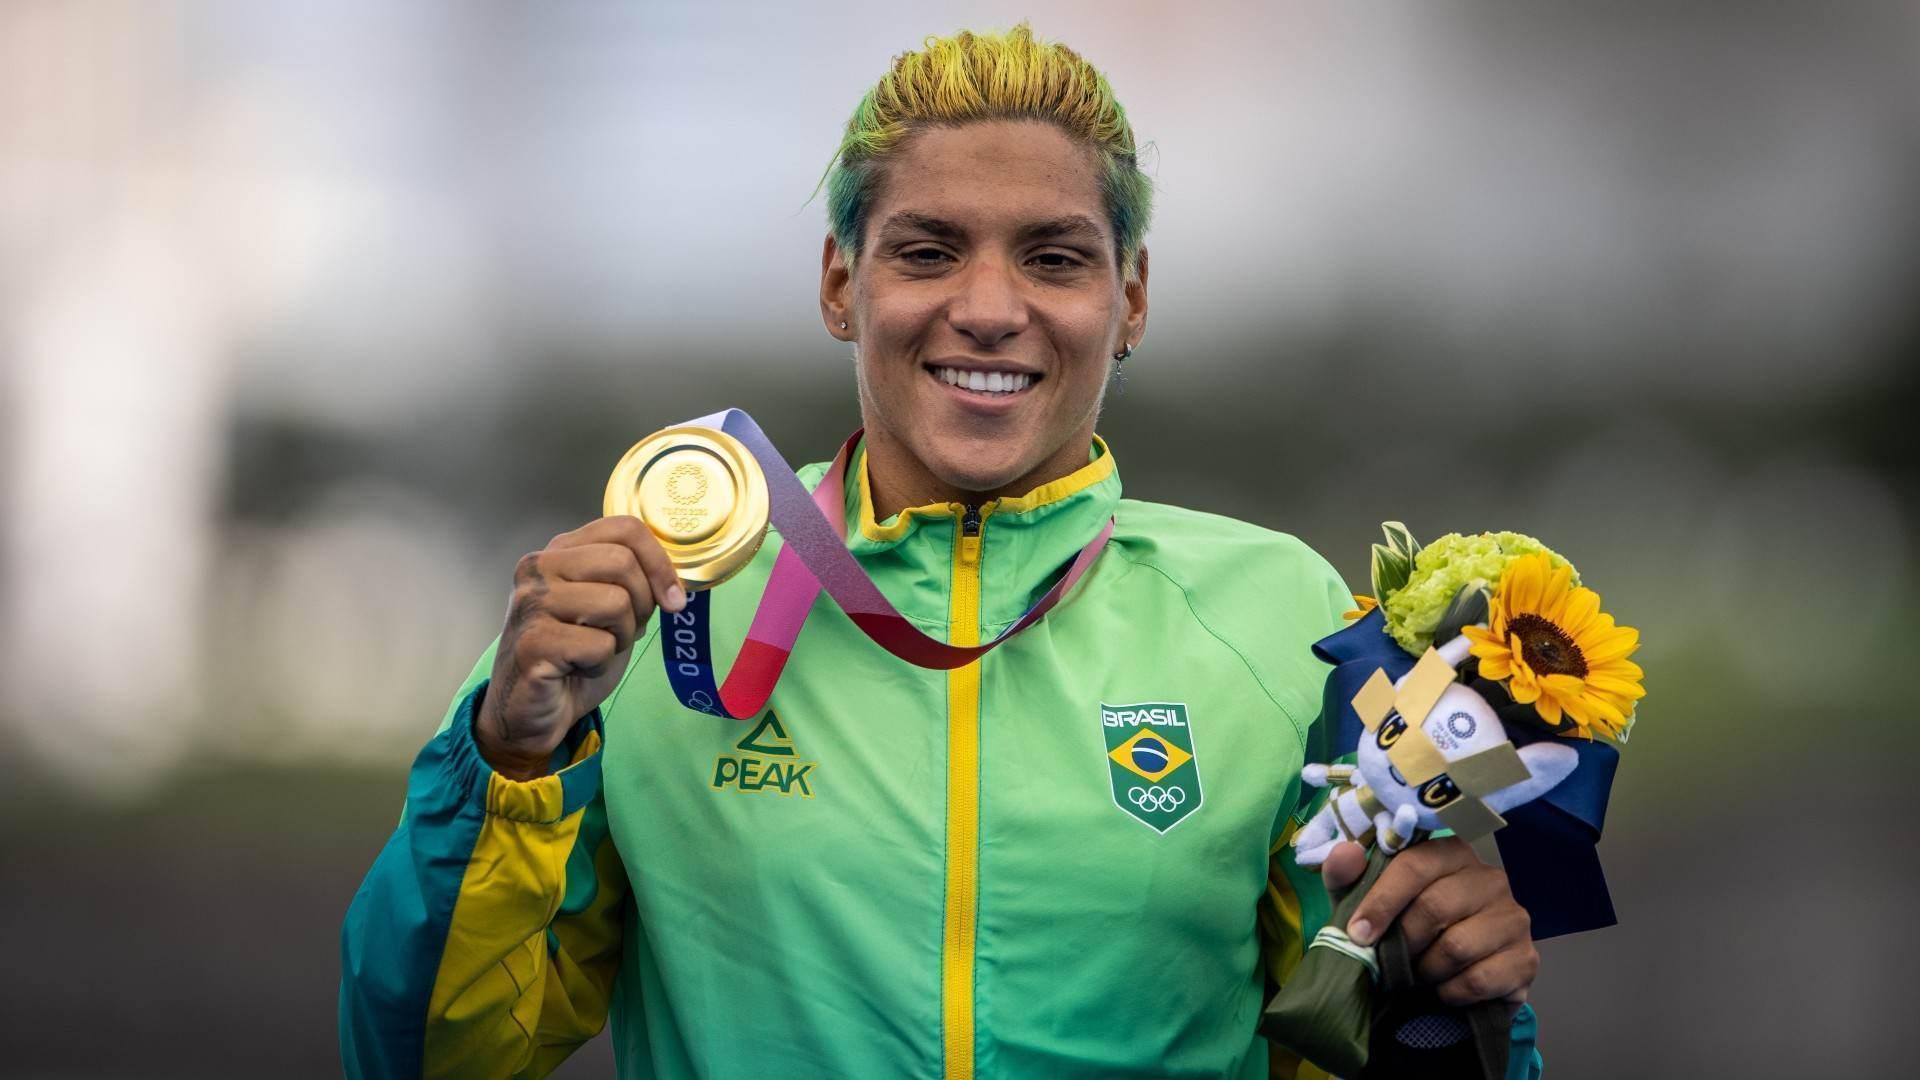 Ana Marcela Cunha, medalha de ouro na maratona aquática